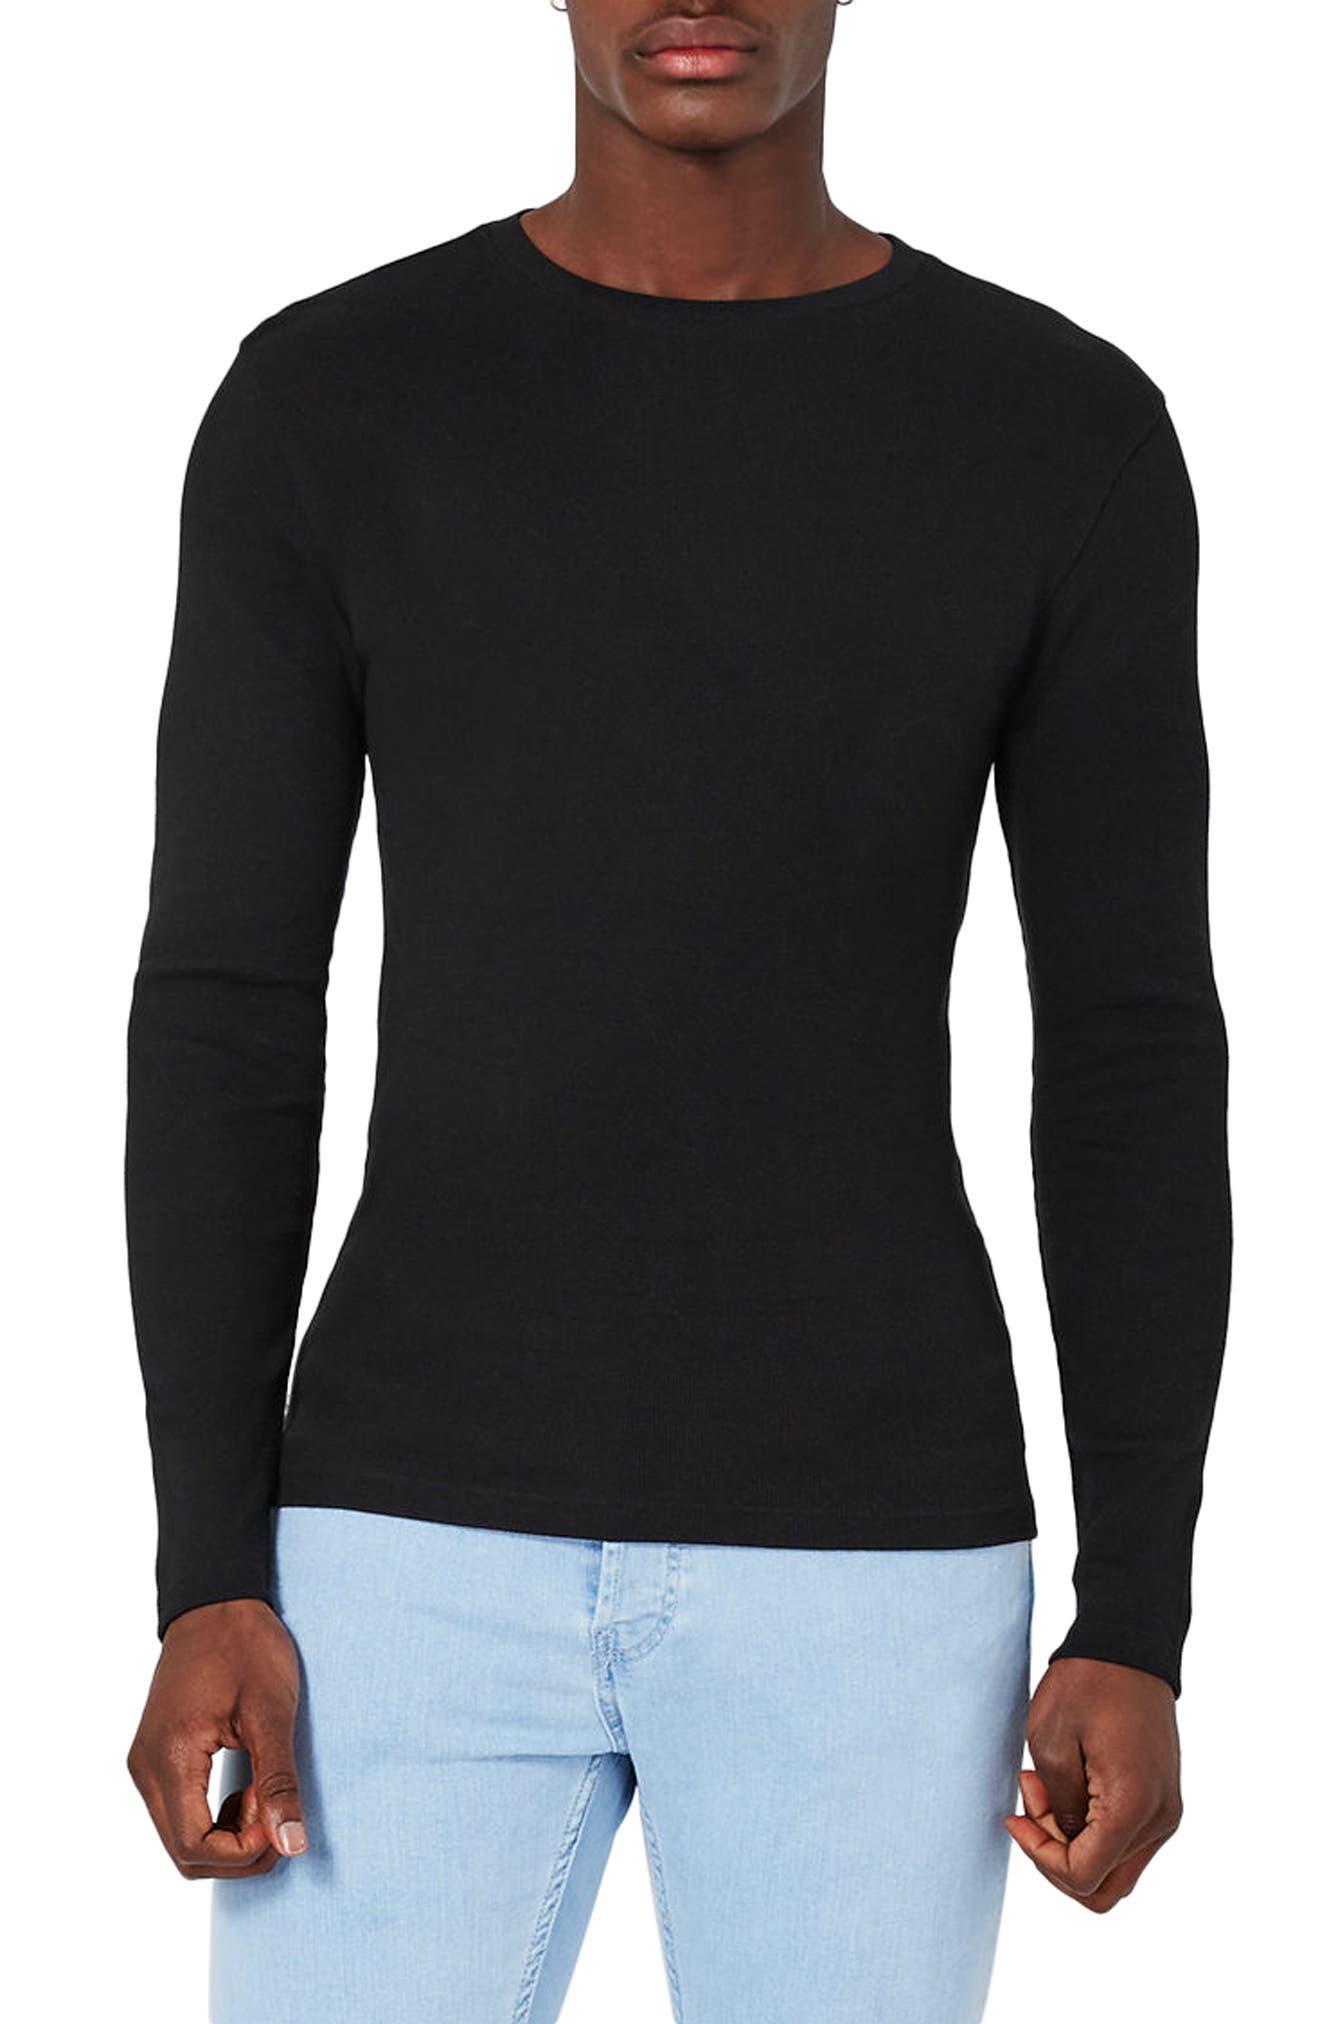 Topman Rib Knit Long Sleeve T-Shirt